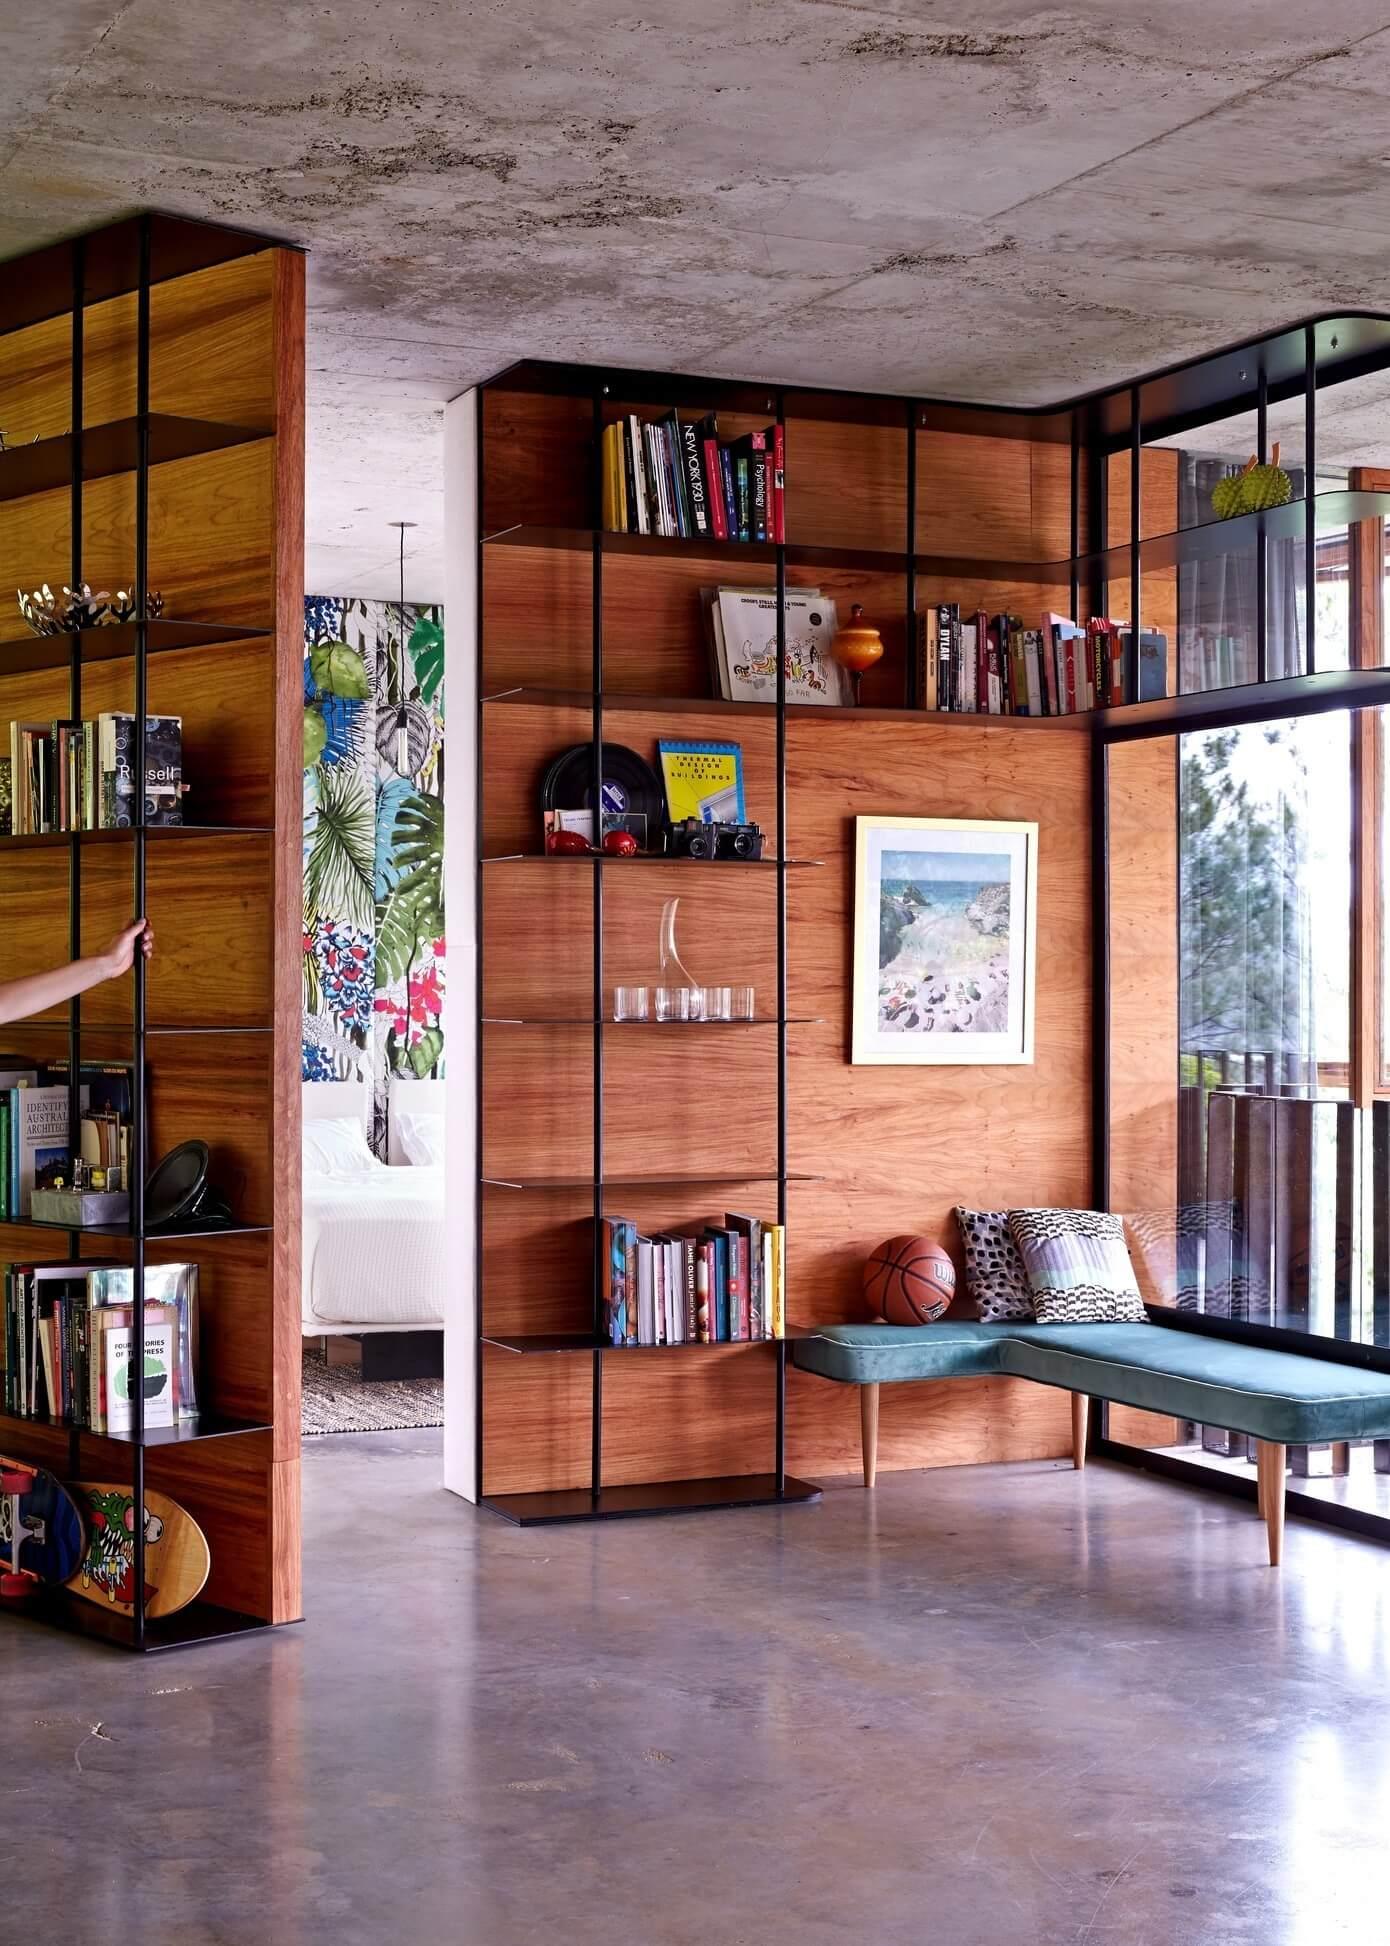 planchonella-house-jesse-bennett-architect-08